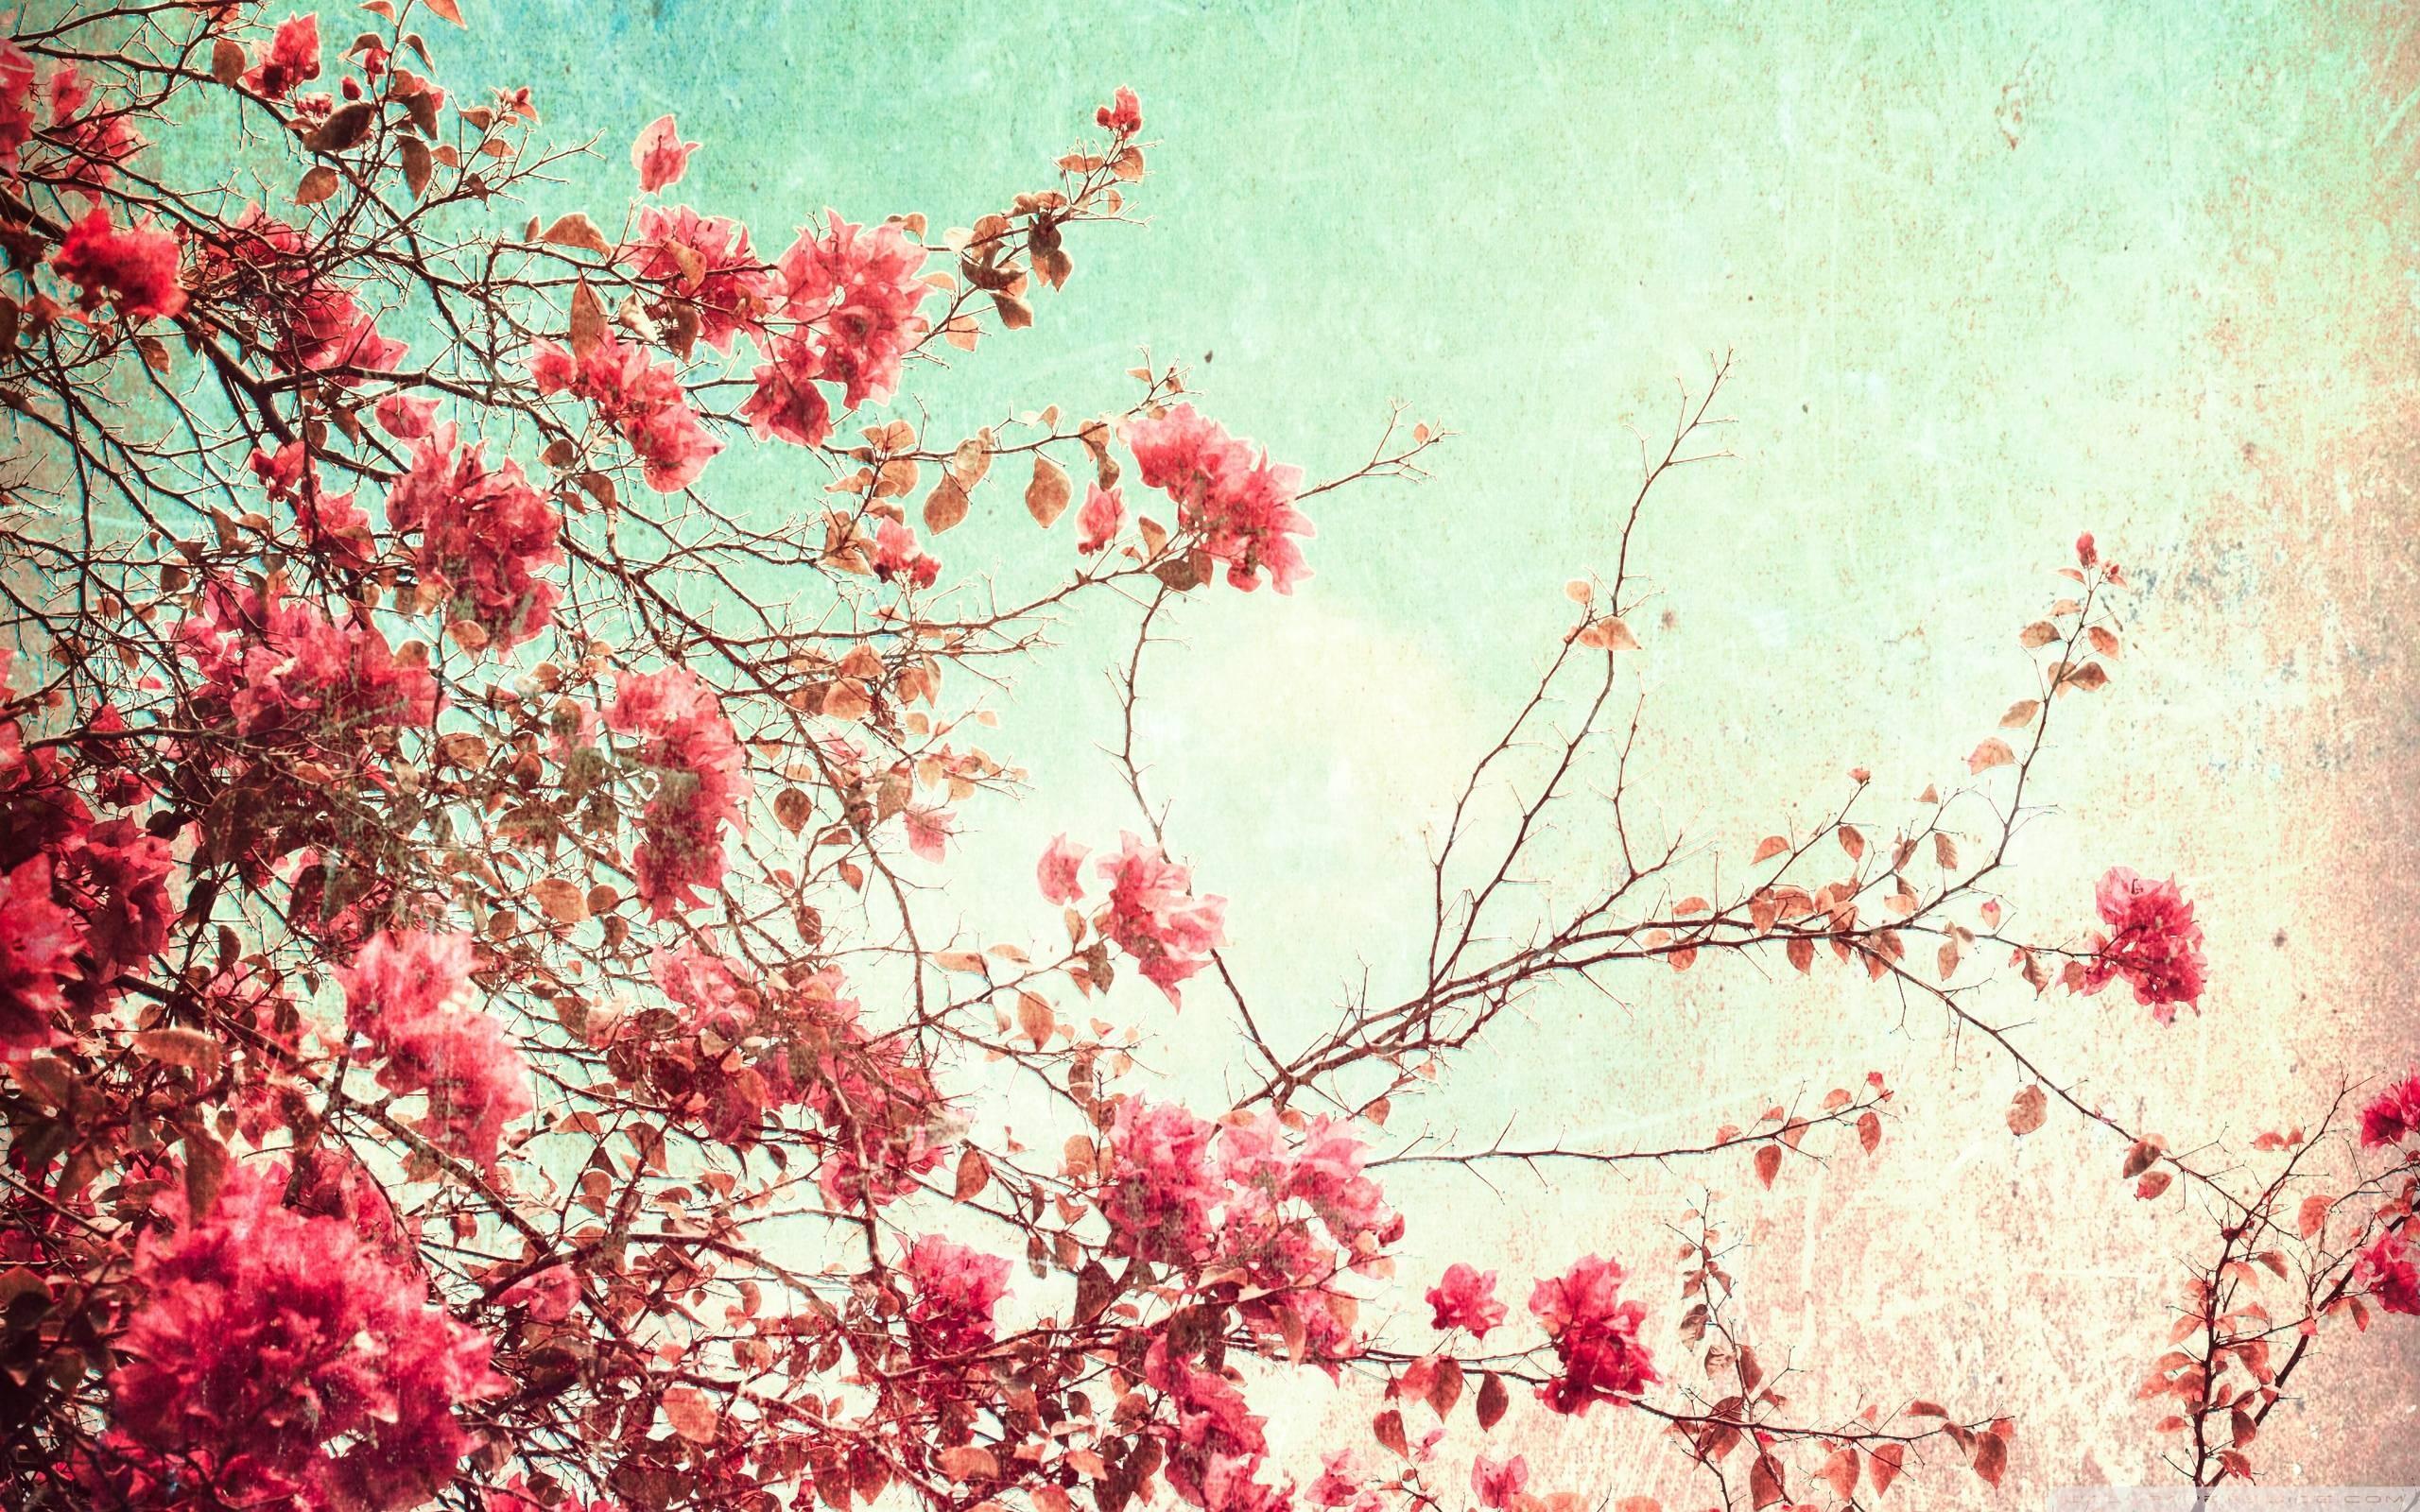 Tumblr desktop wallpaper ·â' Download free awesome full HD